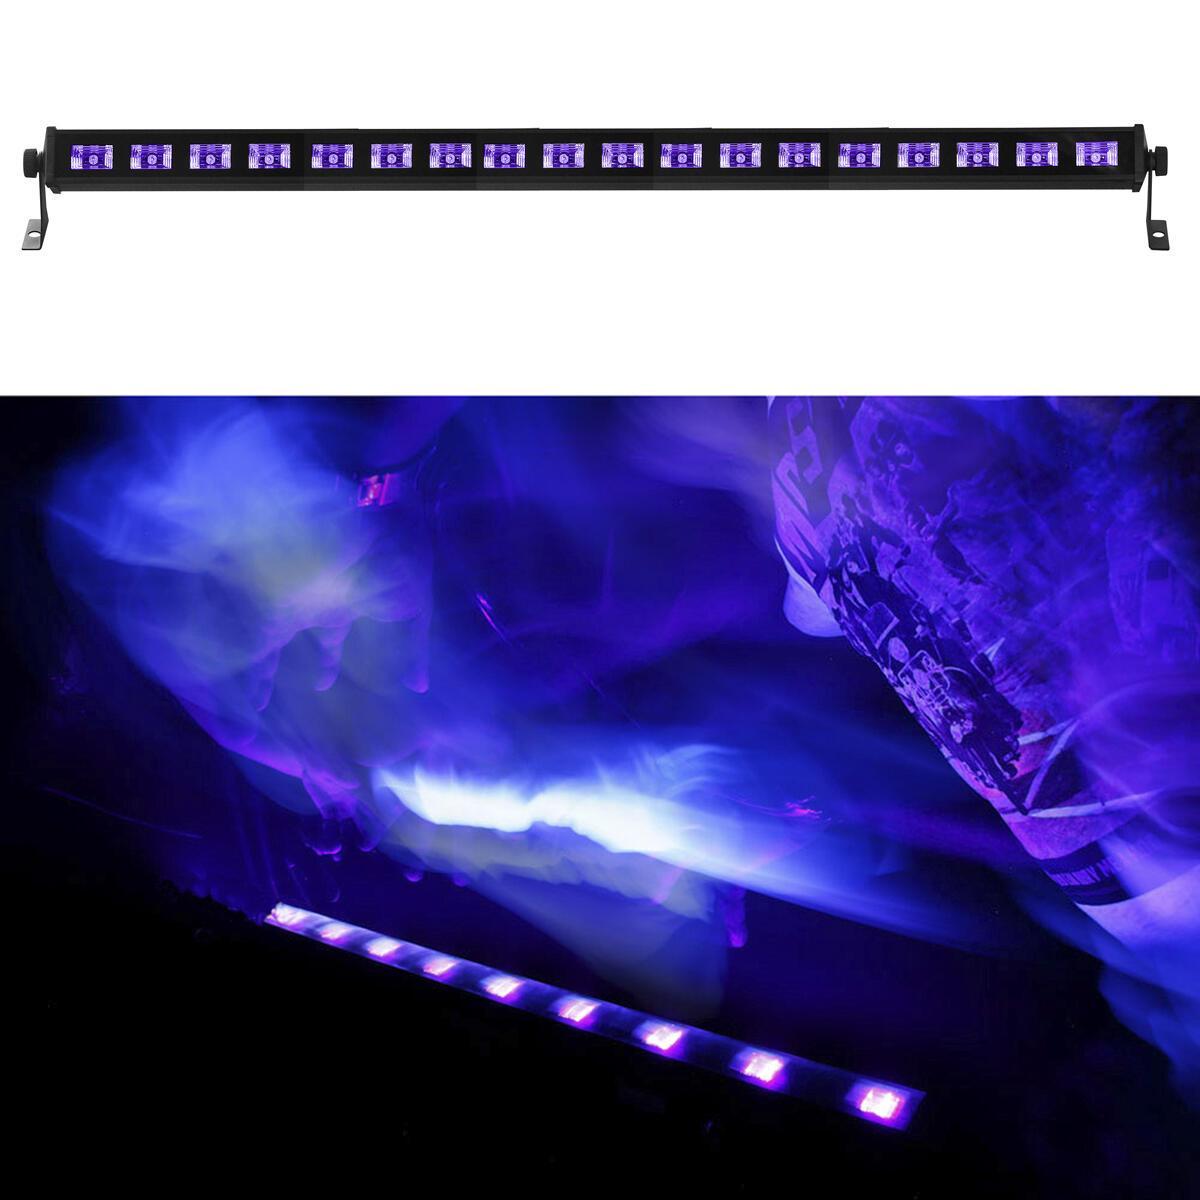 Оренда Ультрафіолетової Лід панелі. UF Led Panel